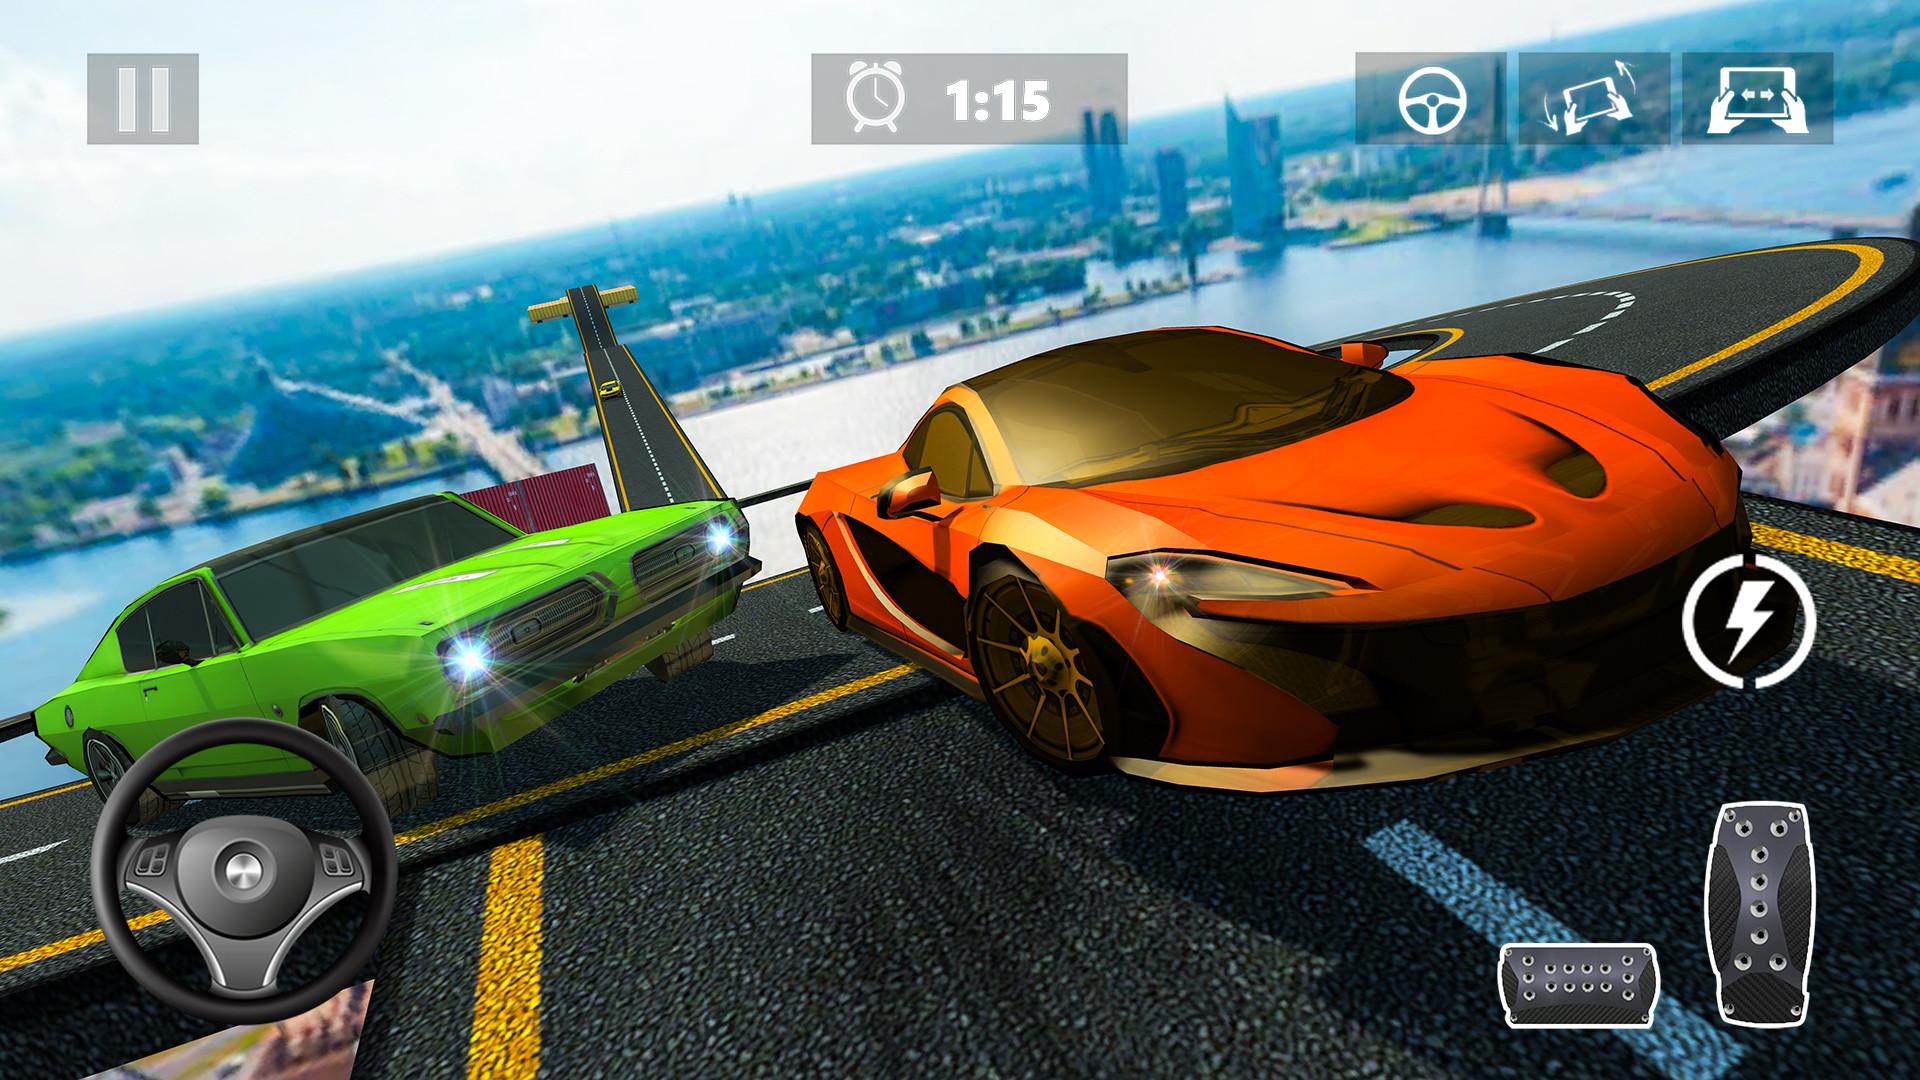 ArtStation - Real Impossible Tracks Stunts - Screenshot - Design